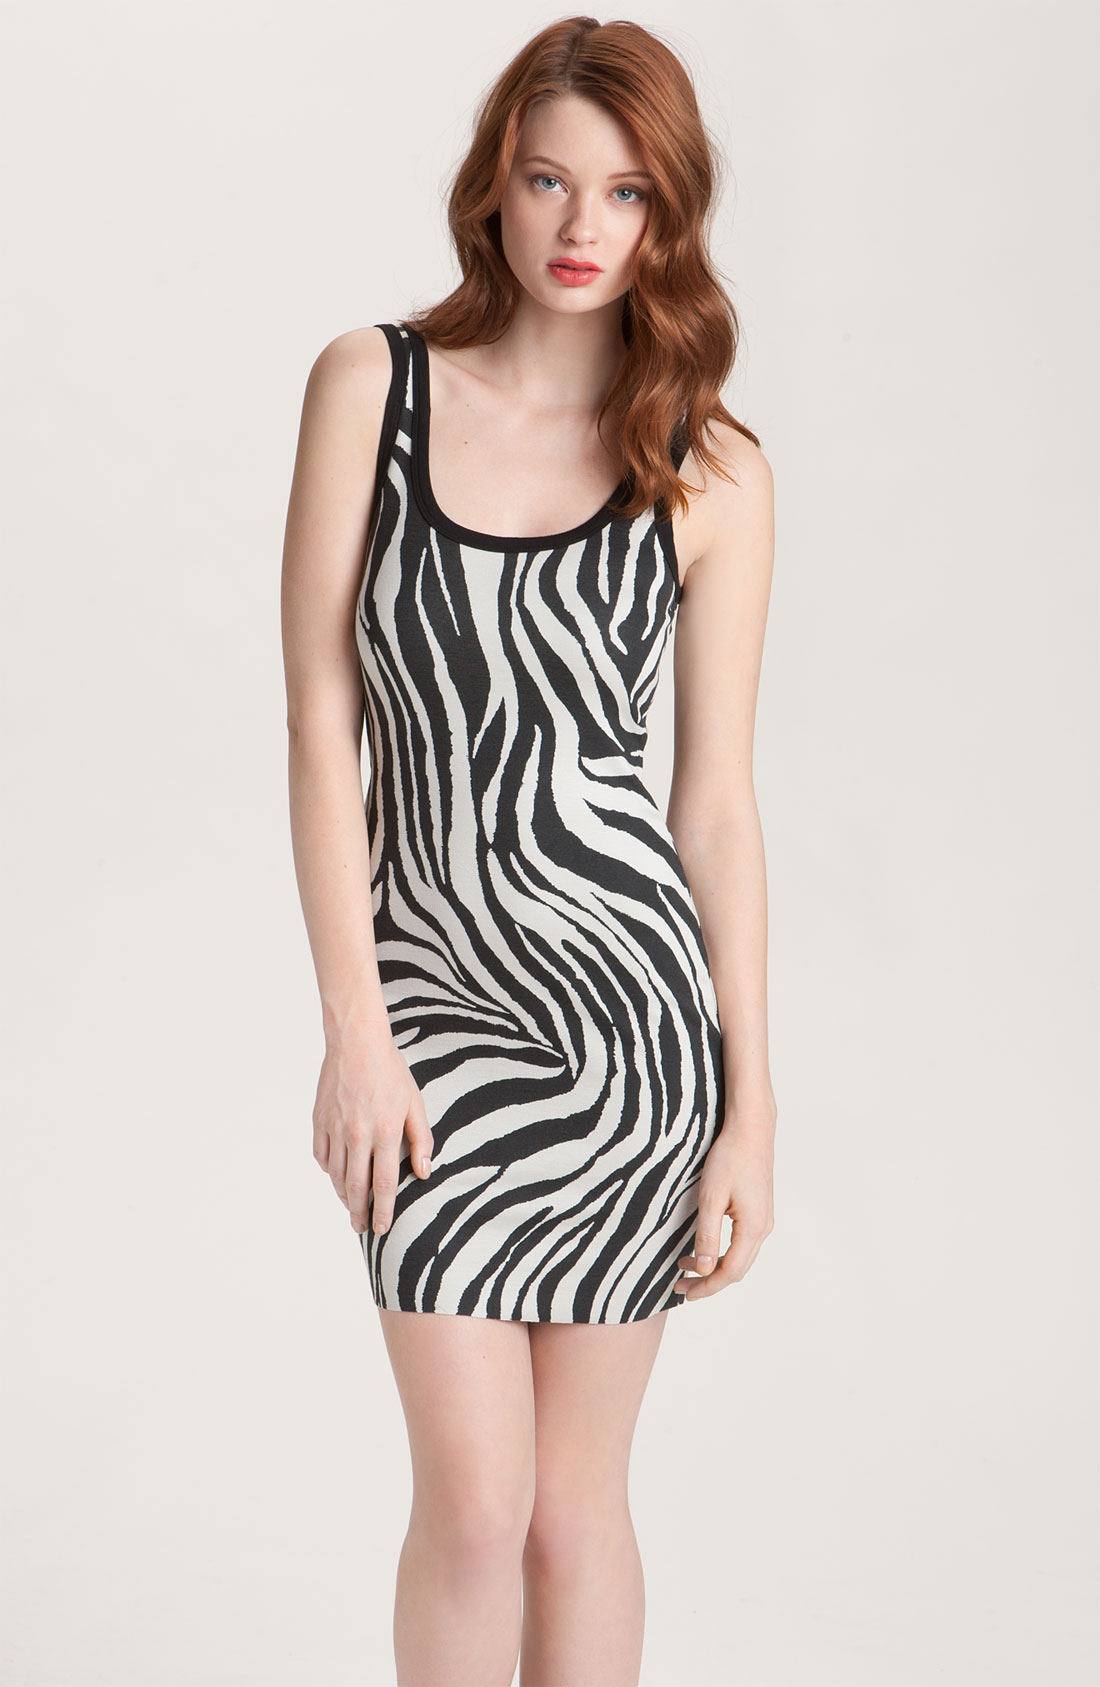 Tiger print dress images